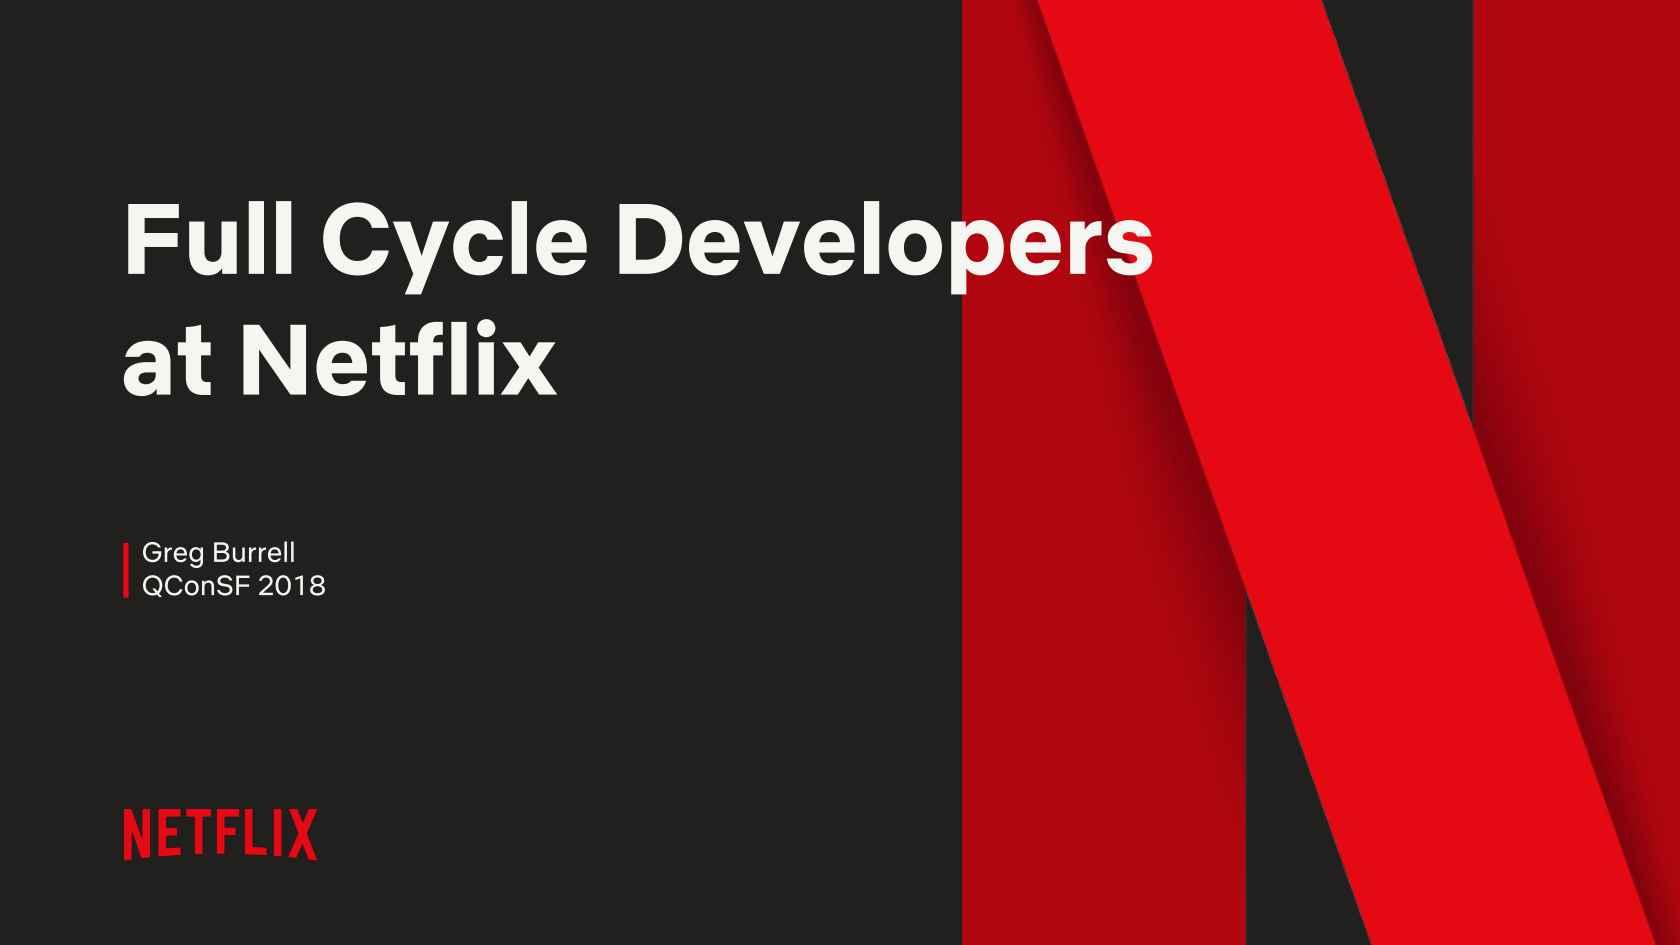 Full Cycle Developers @Netflix